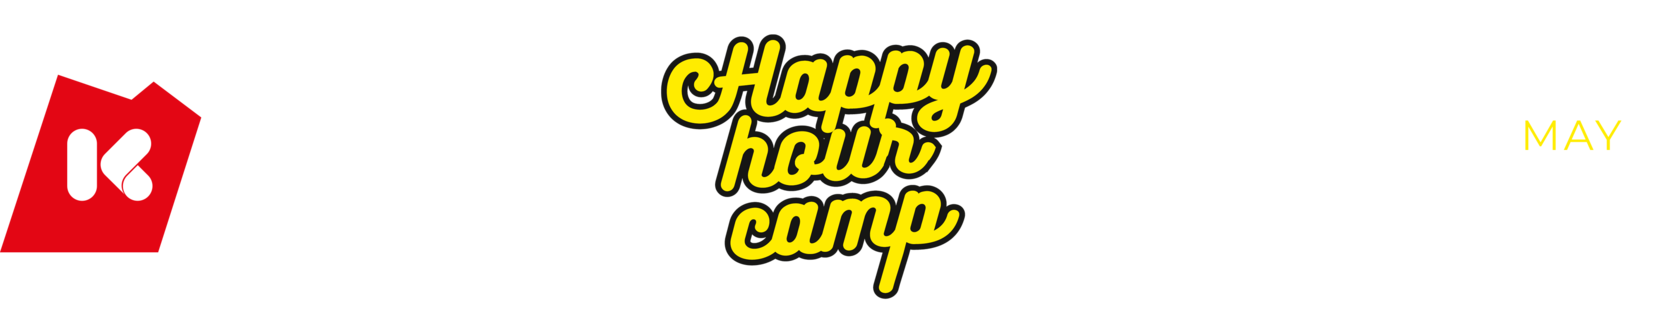 HAPPY HOUR CAMP